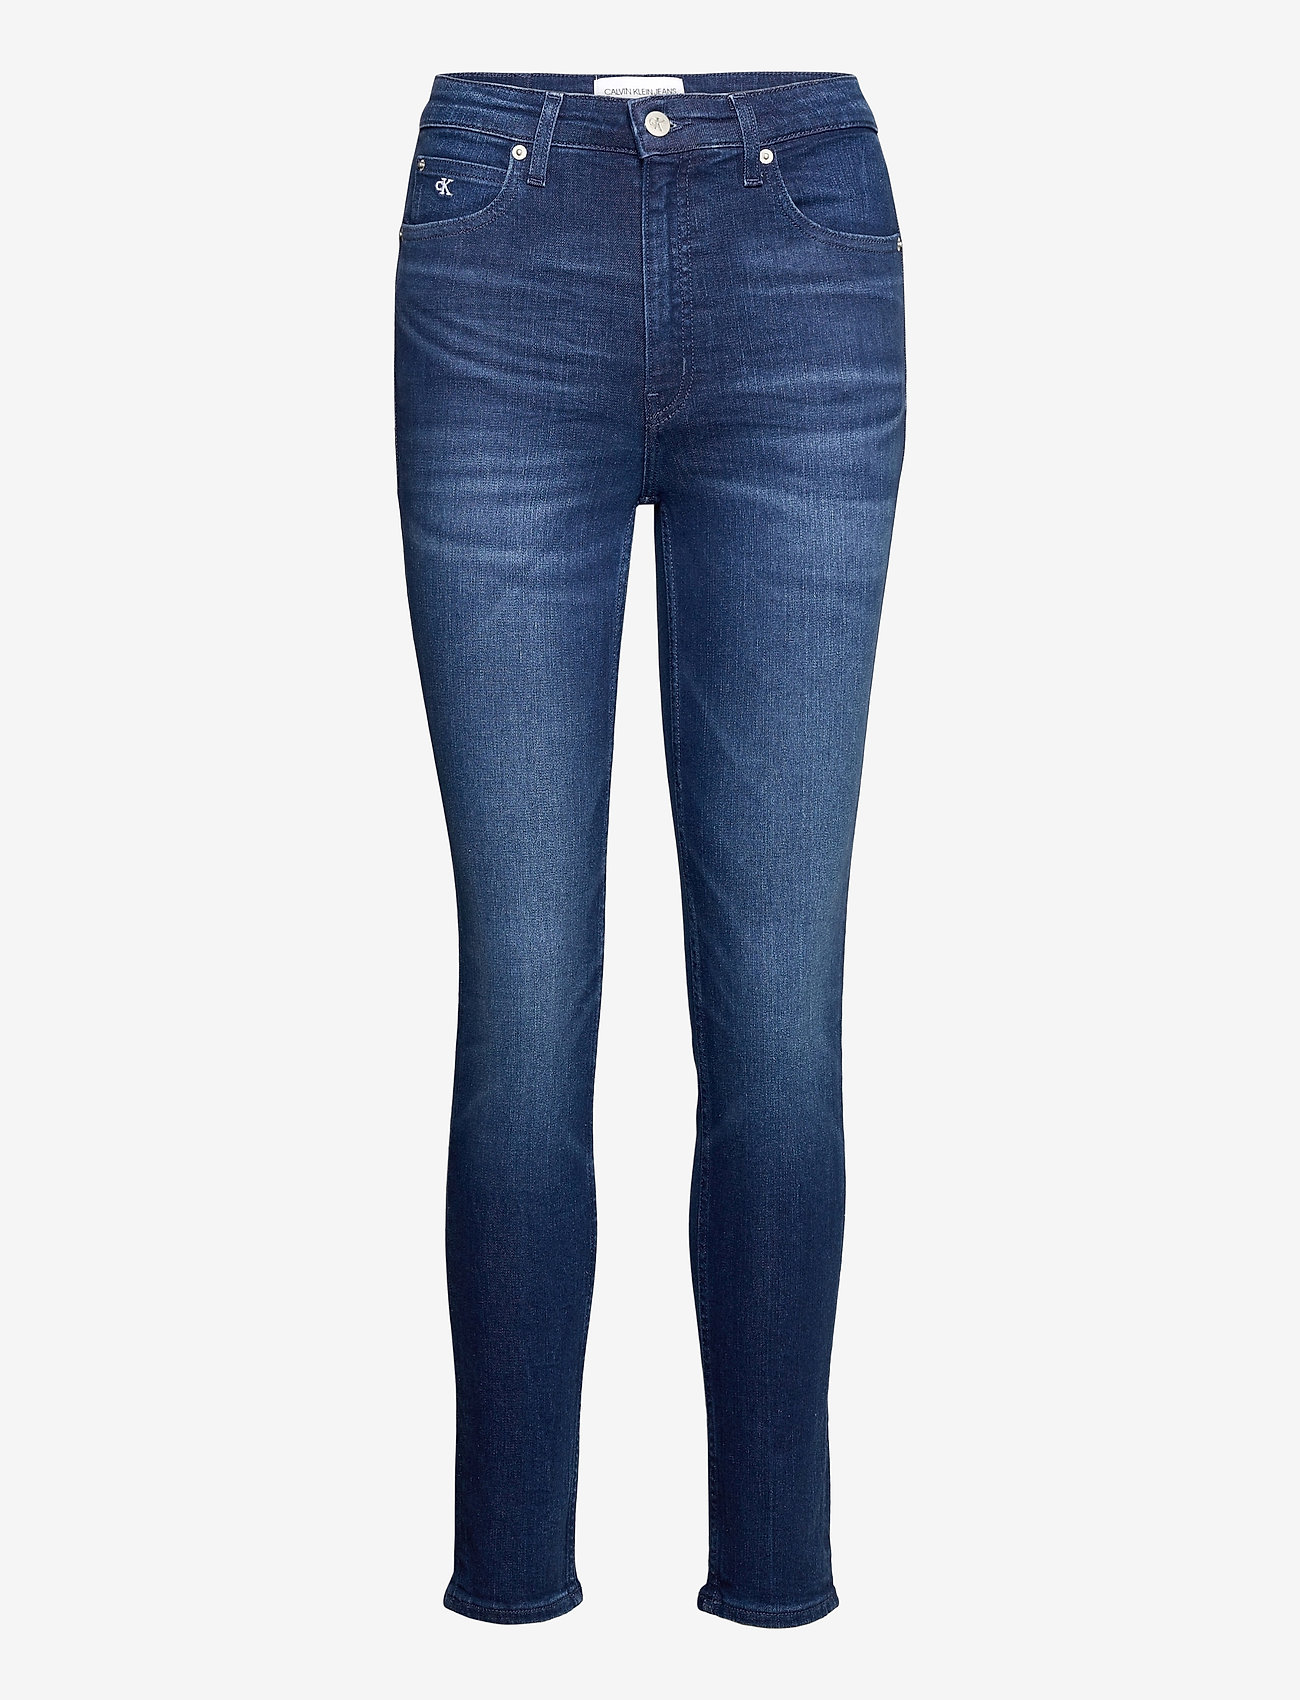 Calvin Klein Jeans - CKJ 010 HIGH RISE SKINNY - skinny jeans - ca060 mid blue - 0